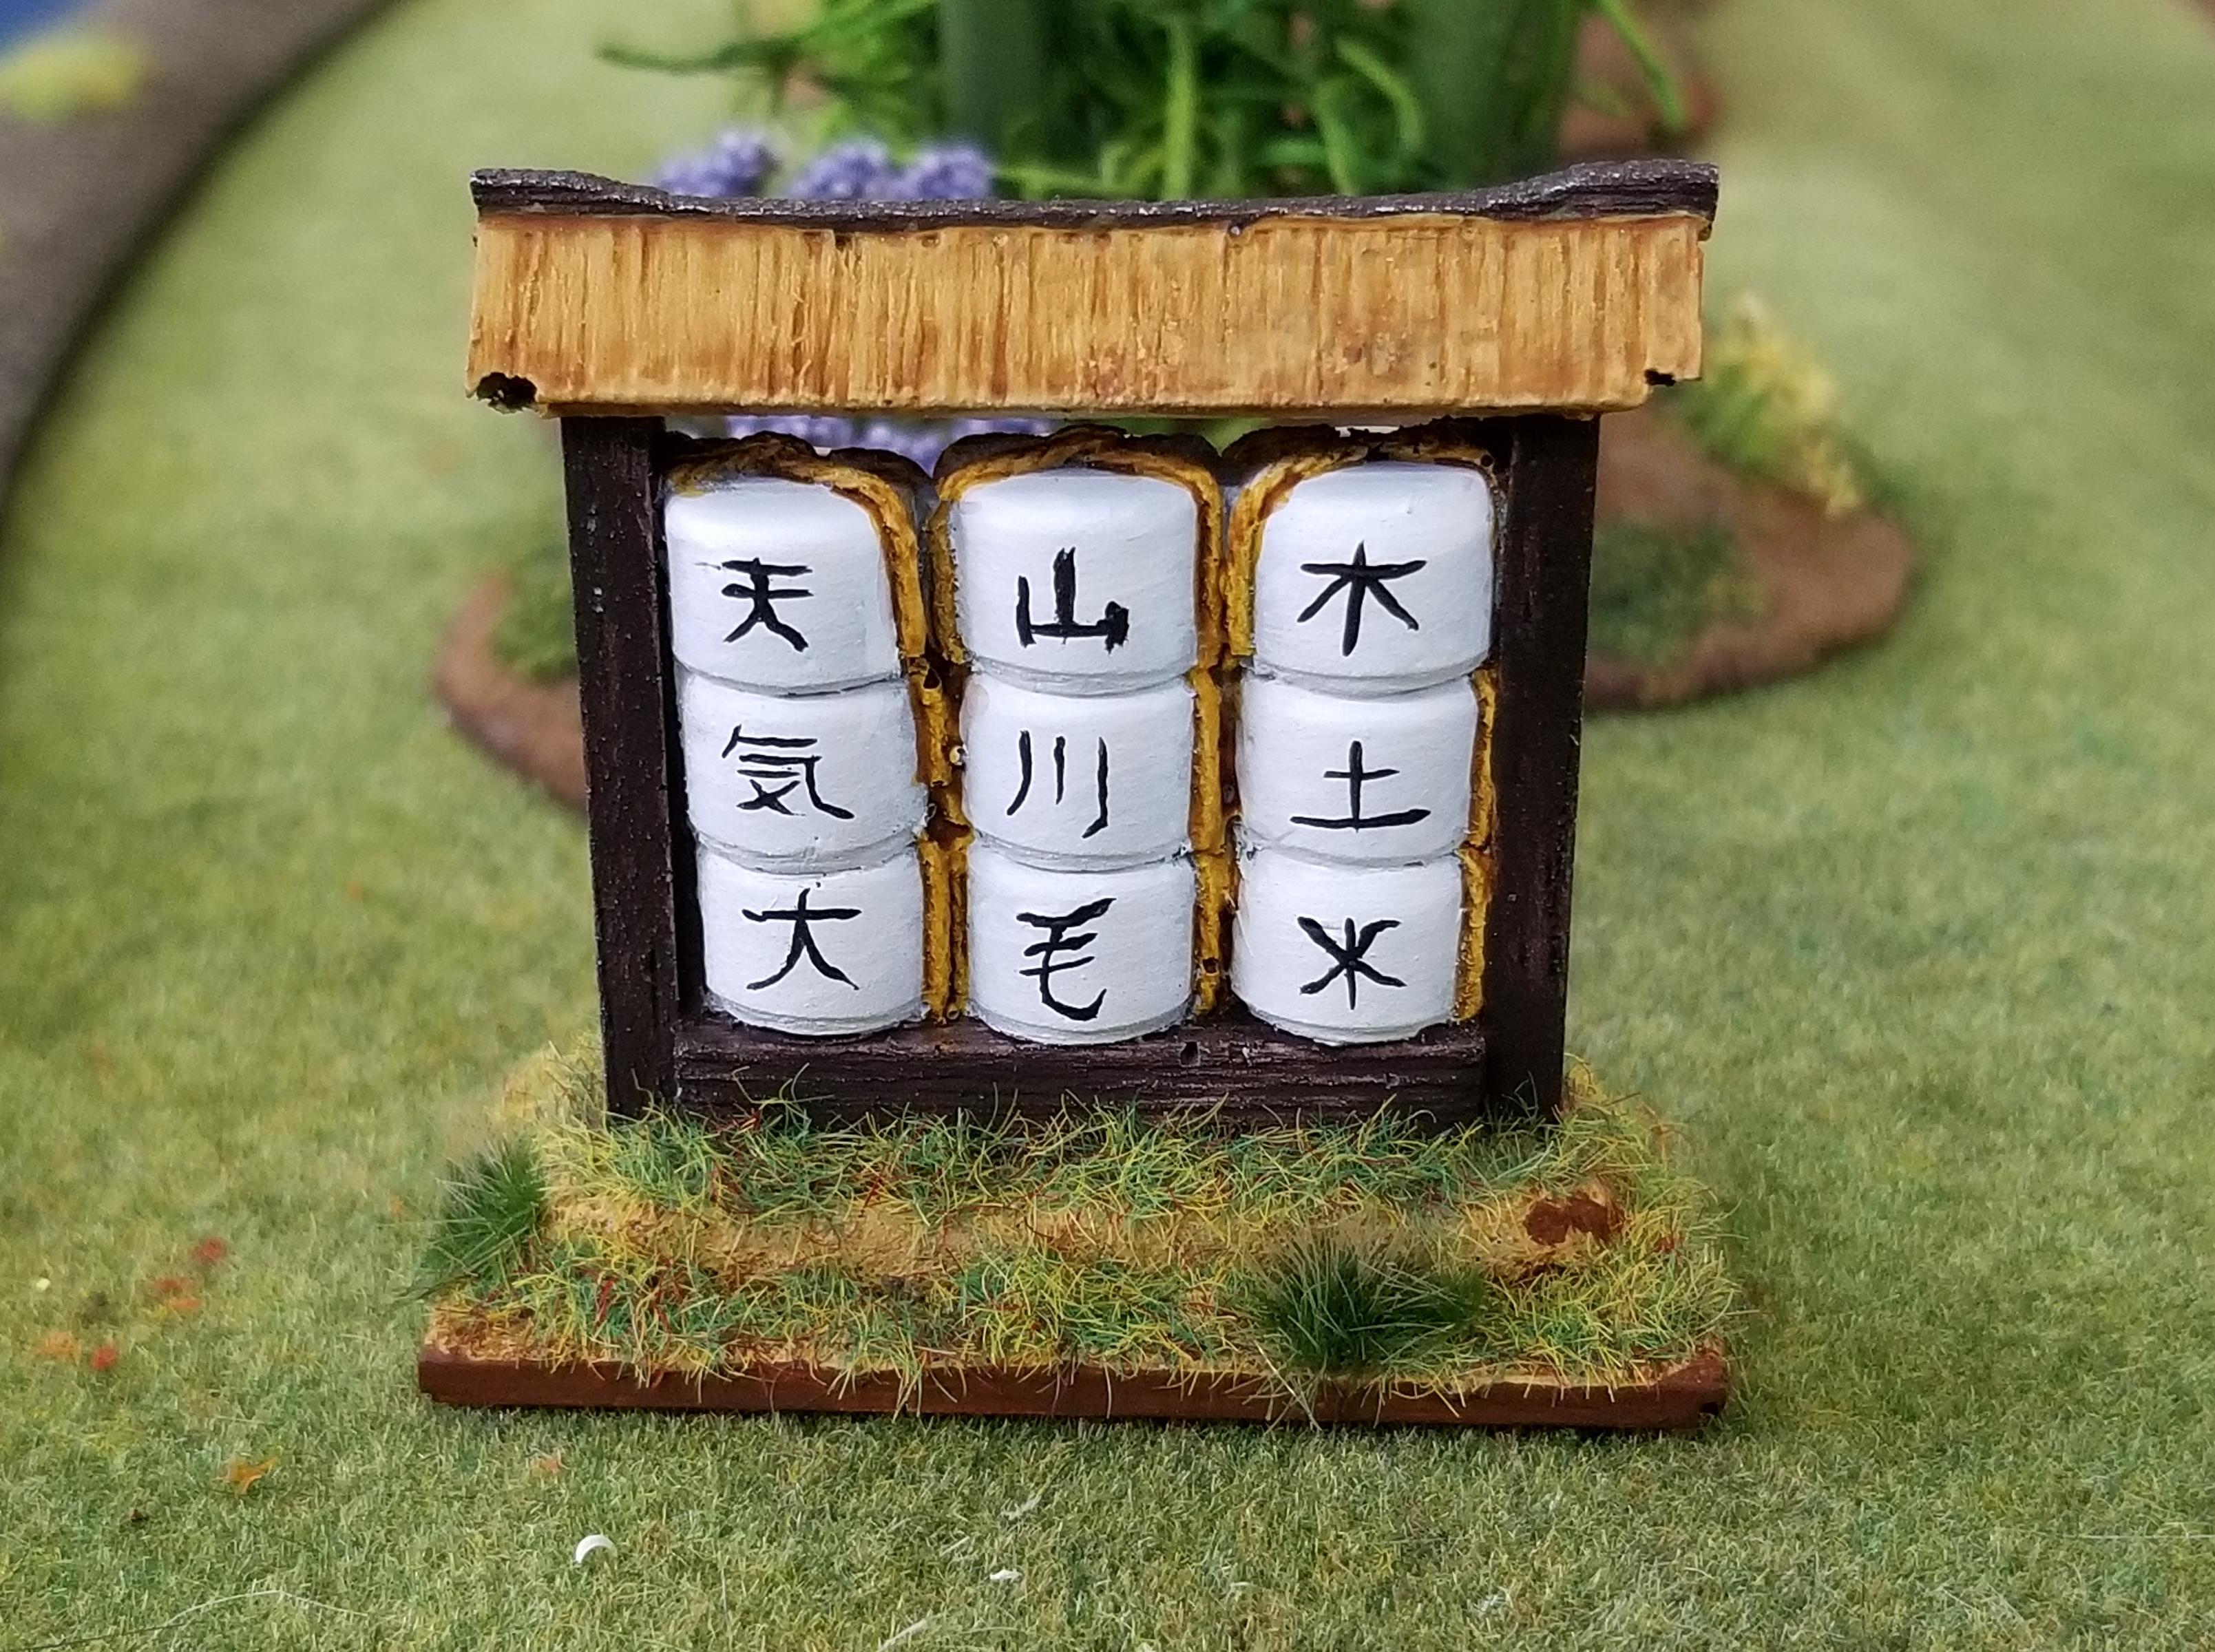 Bushido, Hill Tribes, Ito, Tengu